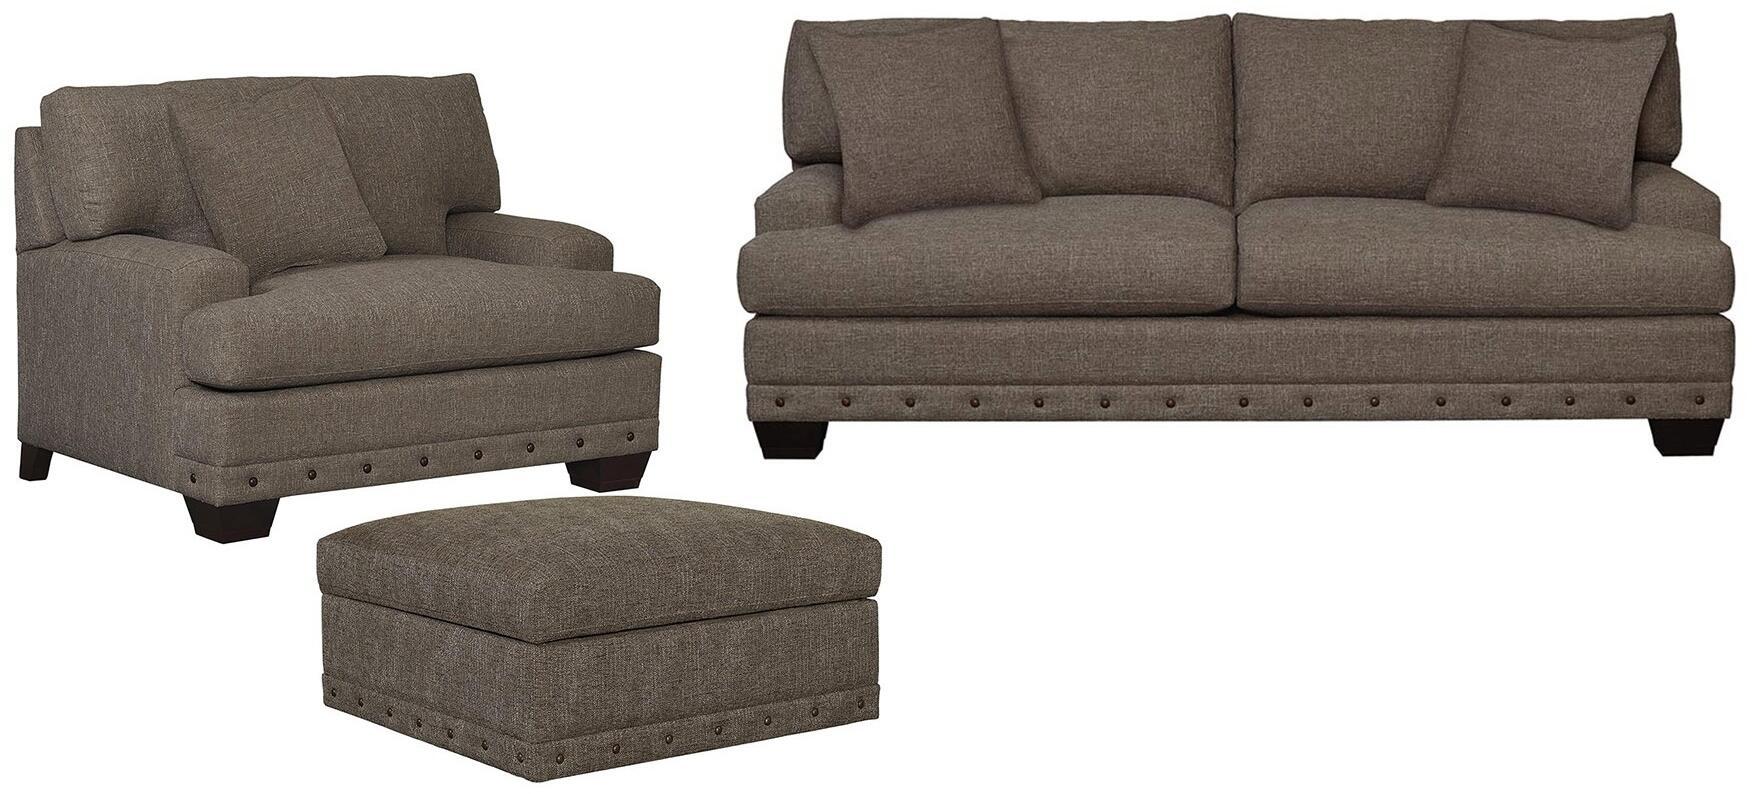 Bassett Furniture 3917fcfc1568sco Carmine Living Room Sets Appliances Connection